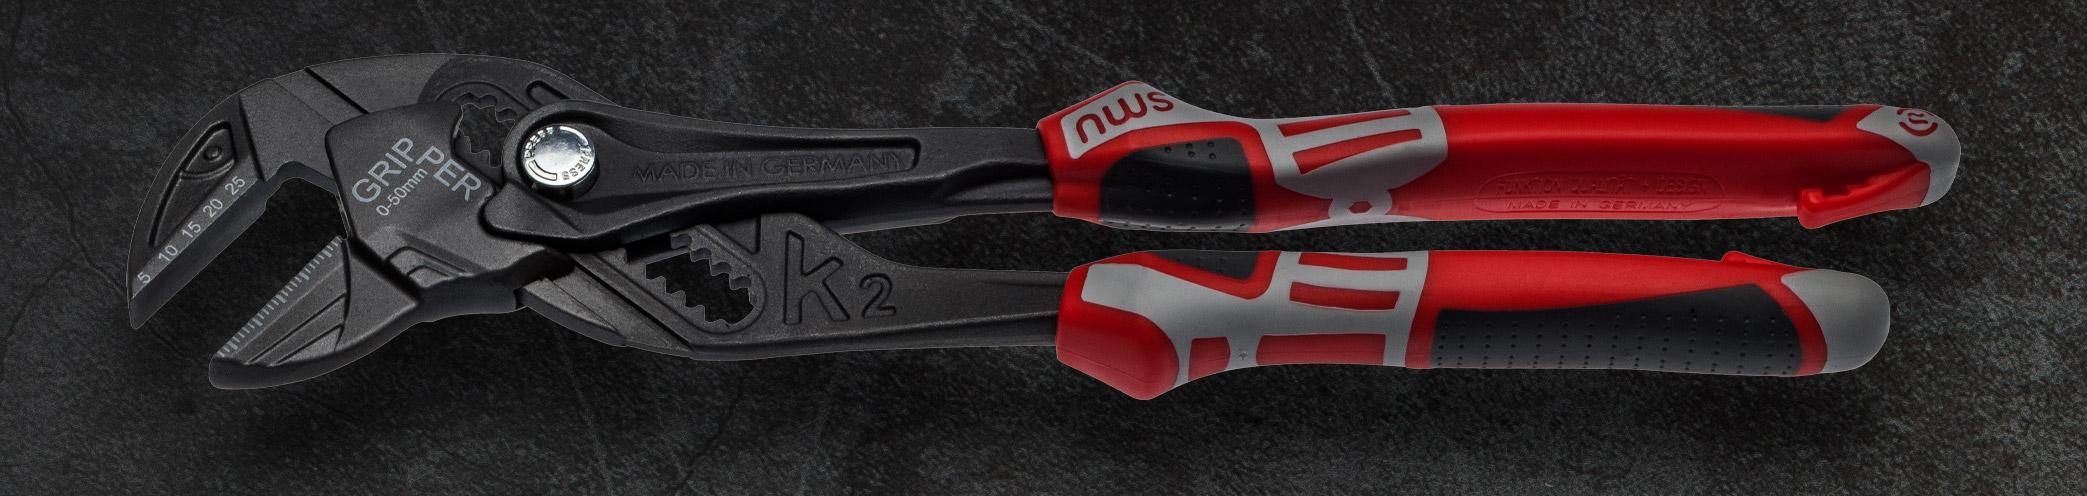 NWS-Gripper-2